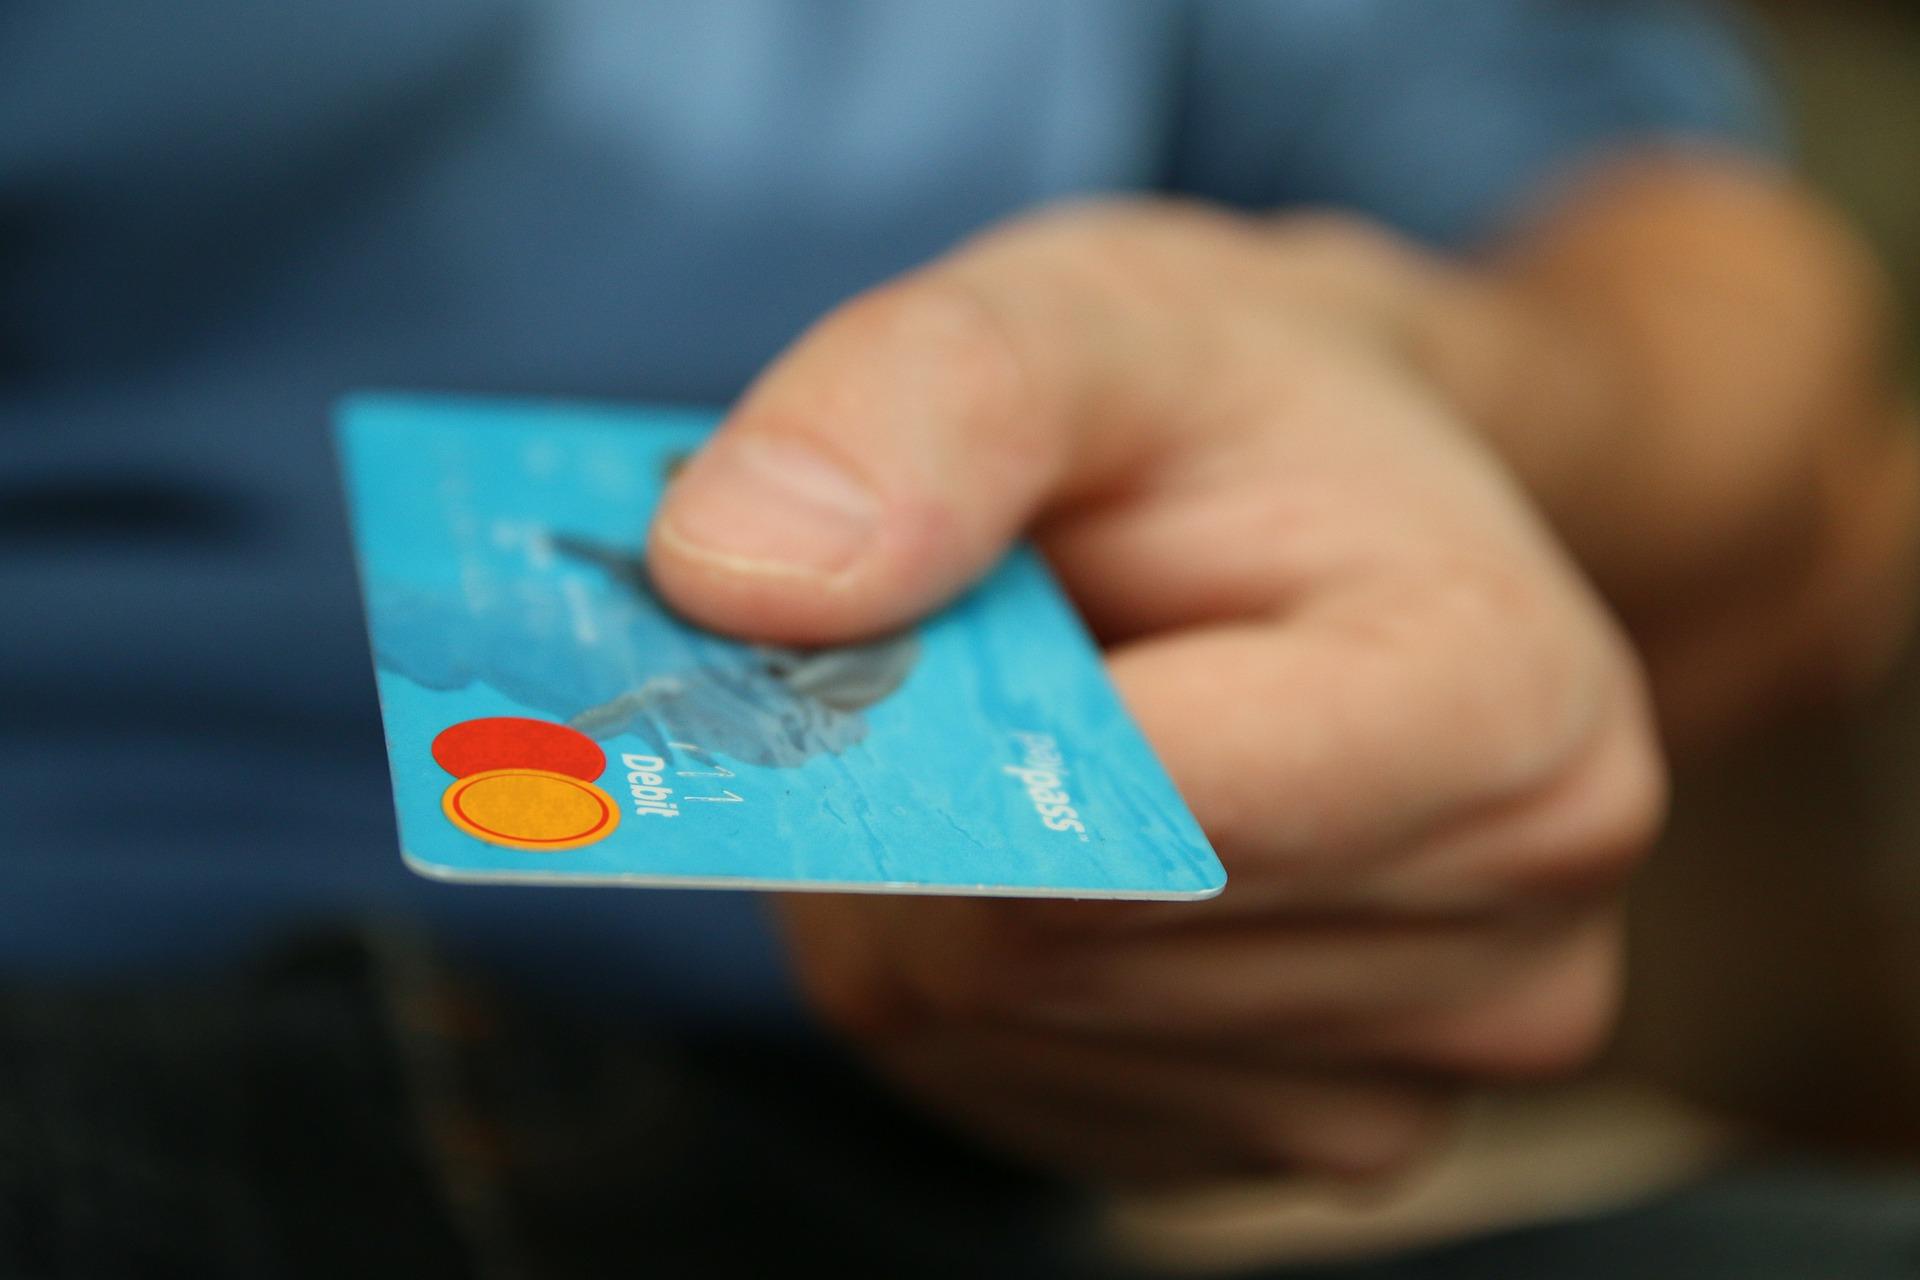 cash advance on income tax refund